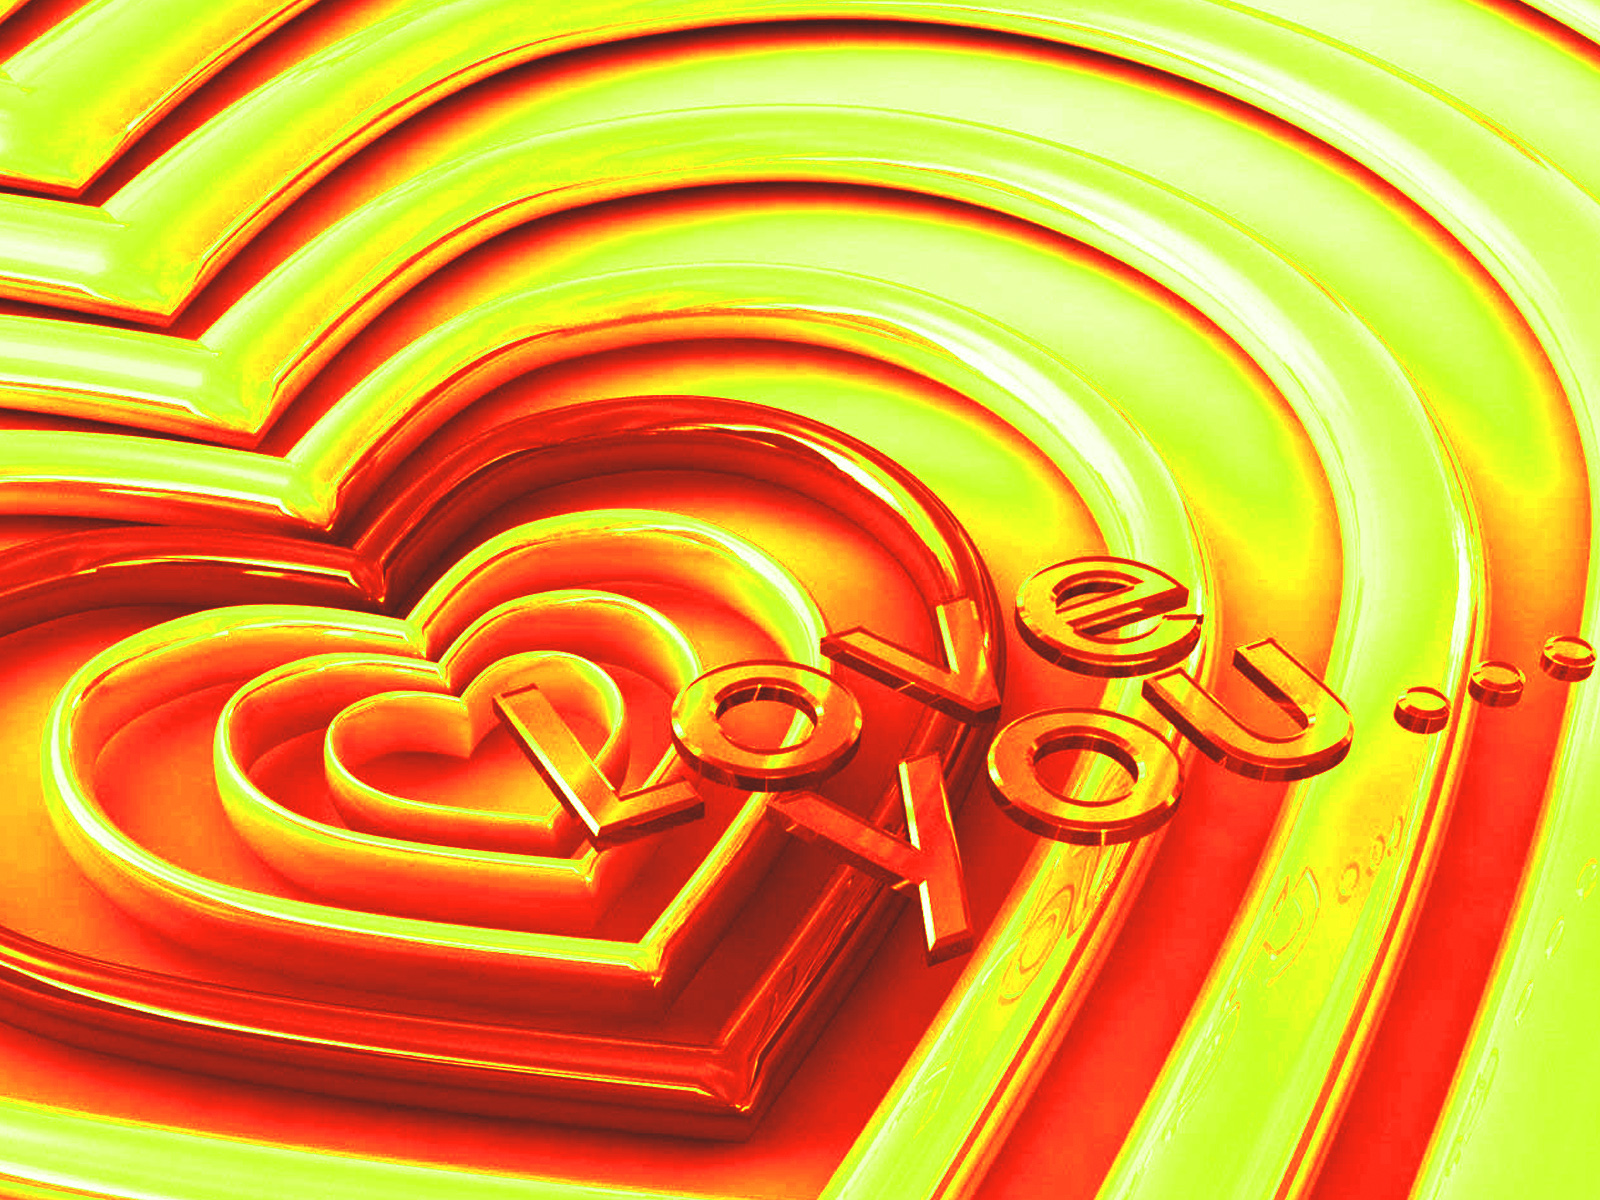 Love 3d Wallpaper Free Download Stylish S Love You 1600x1200 Download Hd Wallpaper Wallpapertip